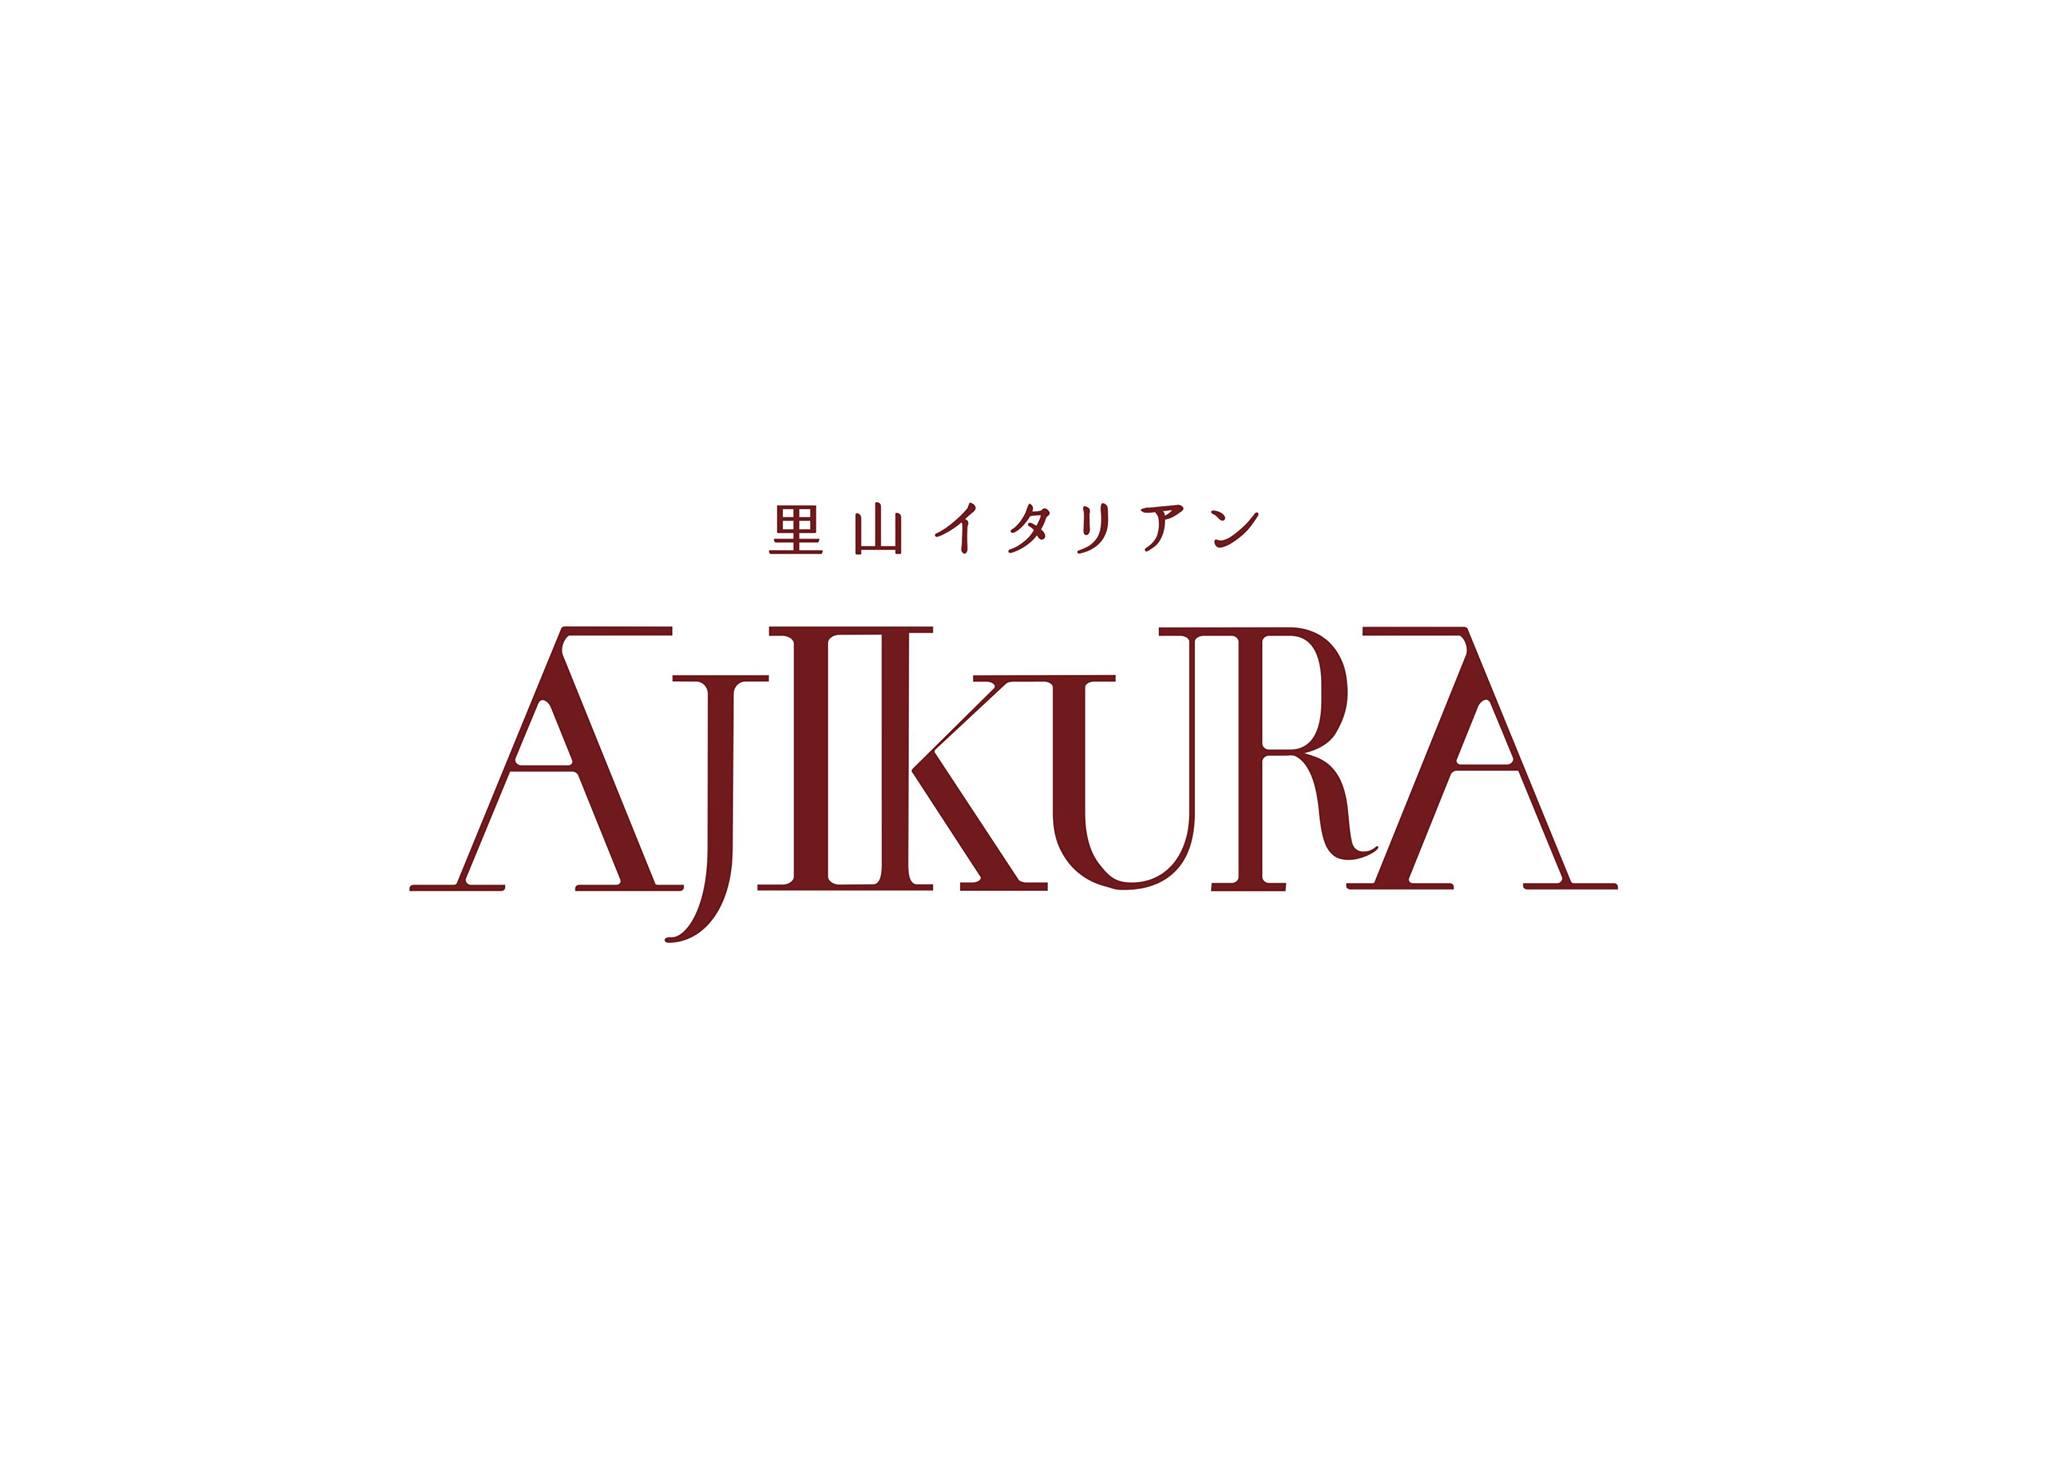 AJIKURAのロゴ